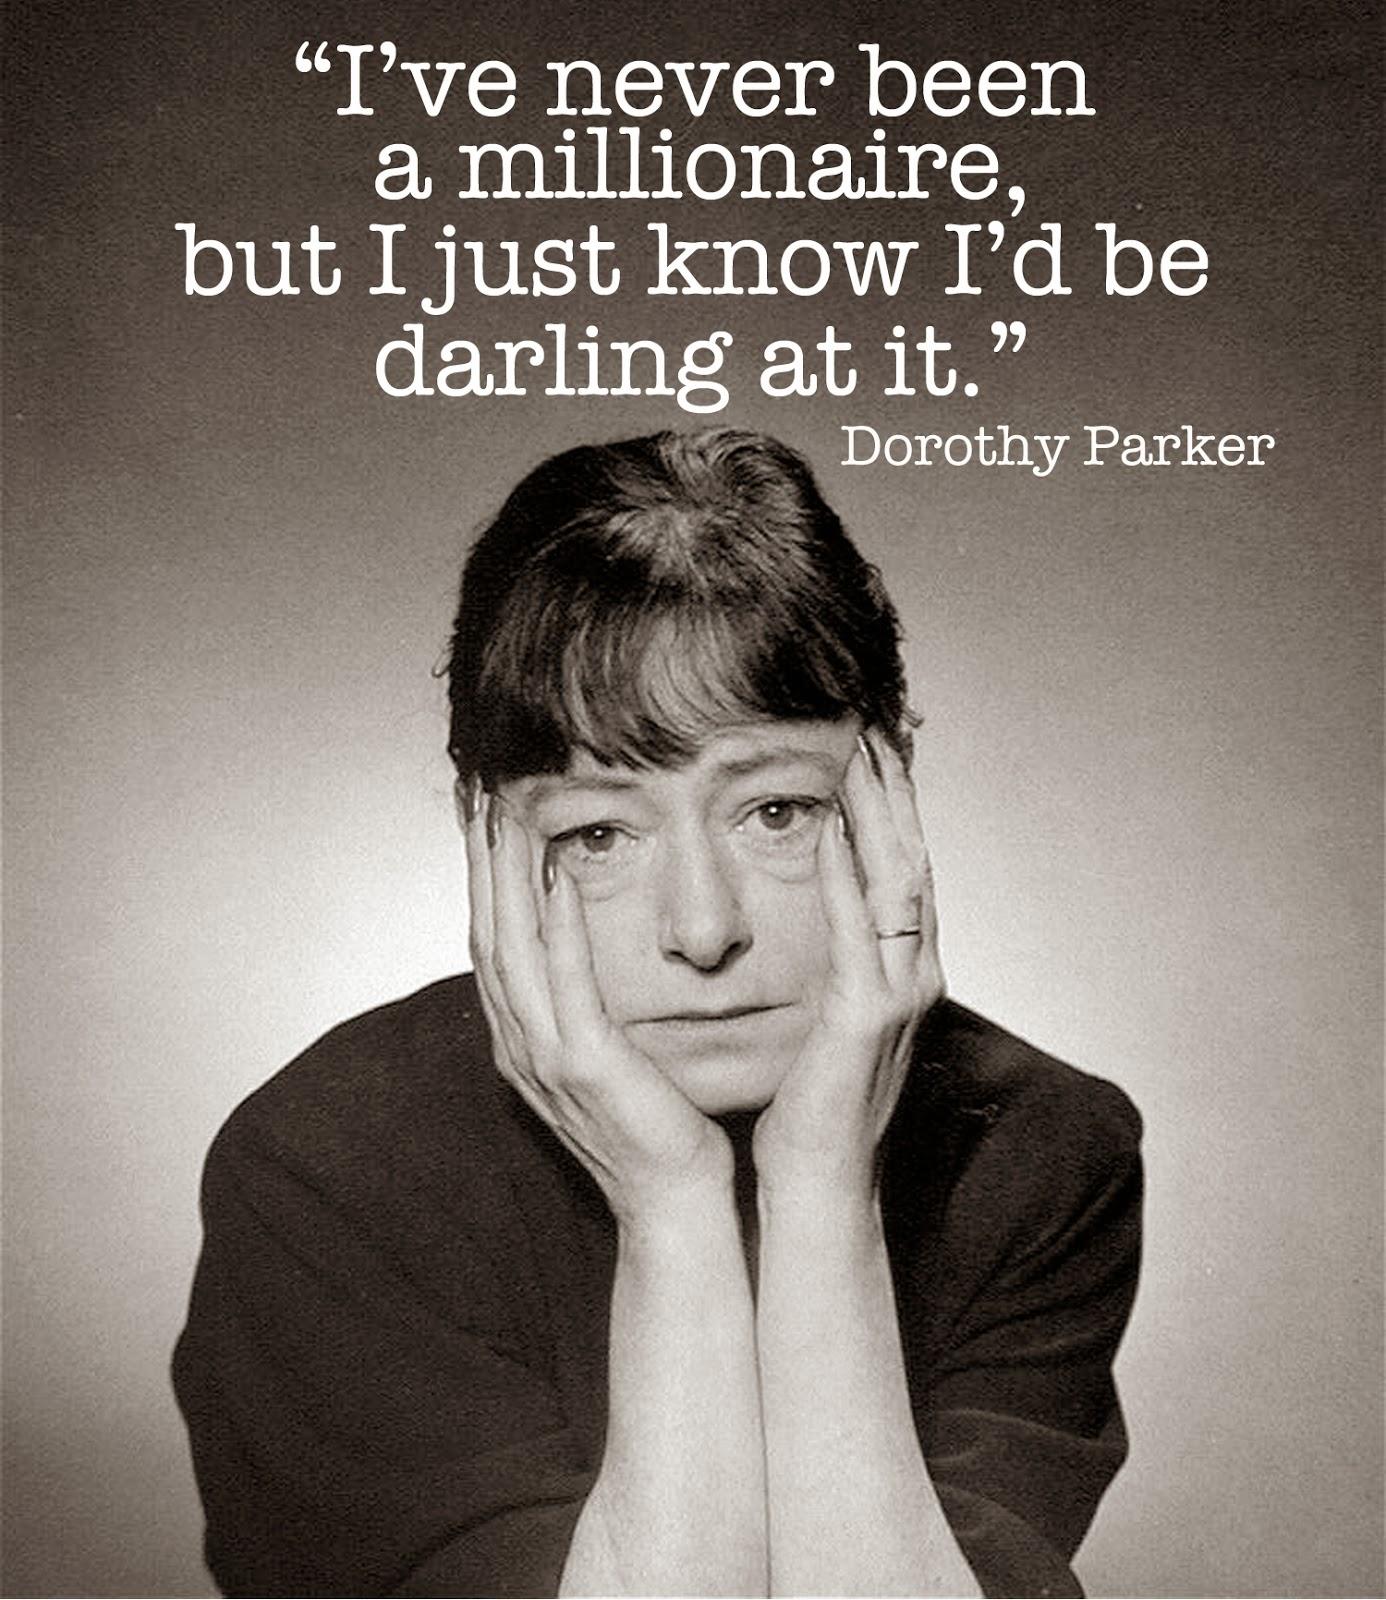 Dorothy Parker Quotes: Millionaire Dorothy Parker Quotes. QuotesGram